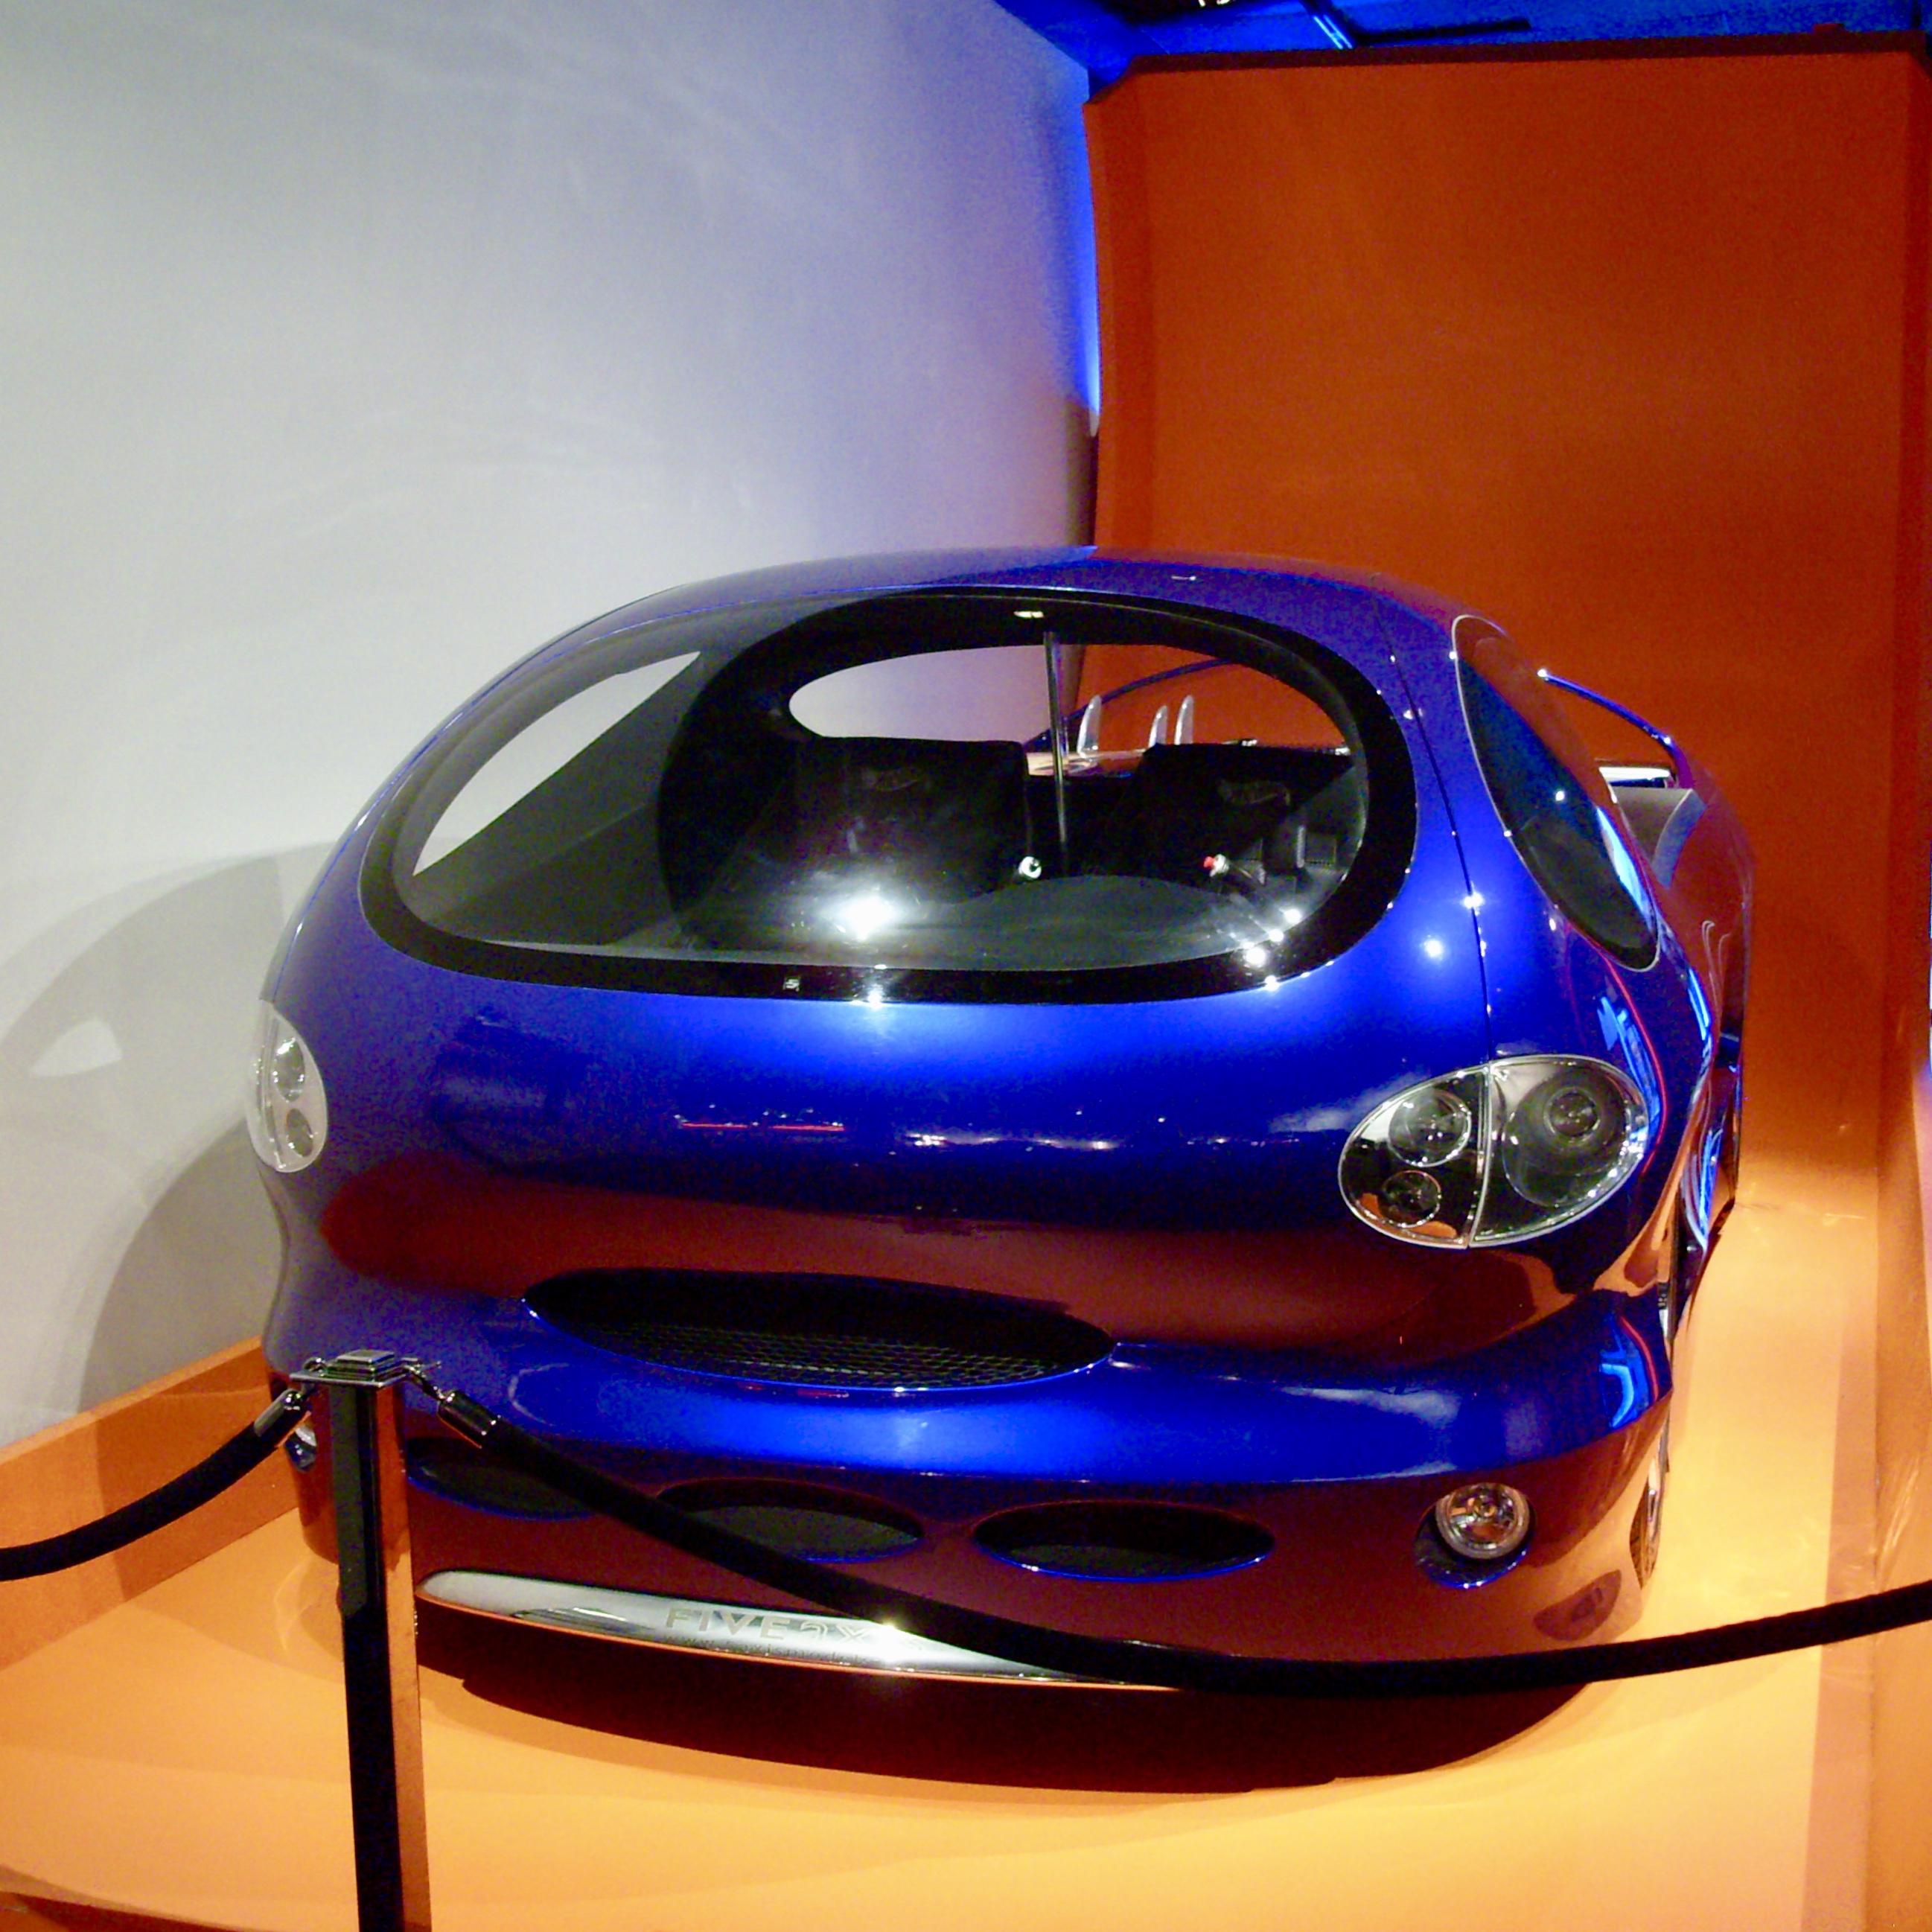 Hot Wheels Car at the Petersen Automotive Museum in LA, CA by Jez Braithwaite